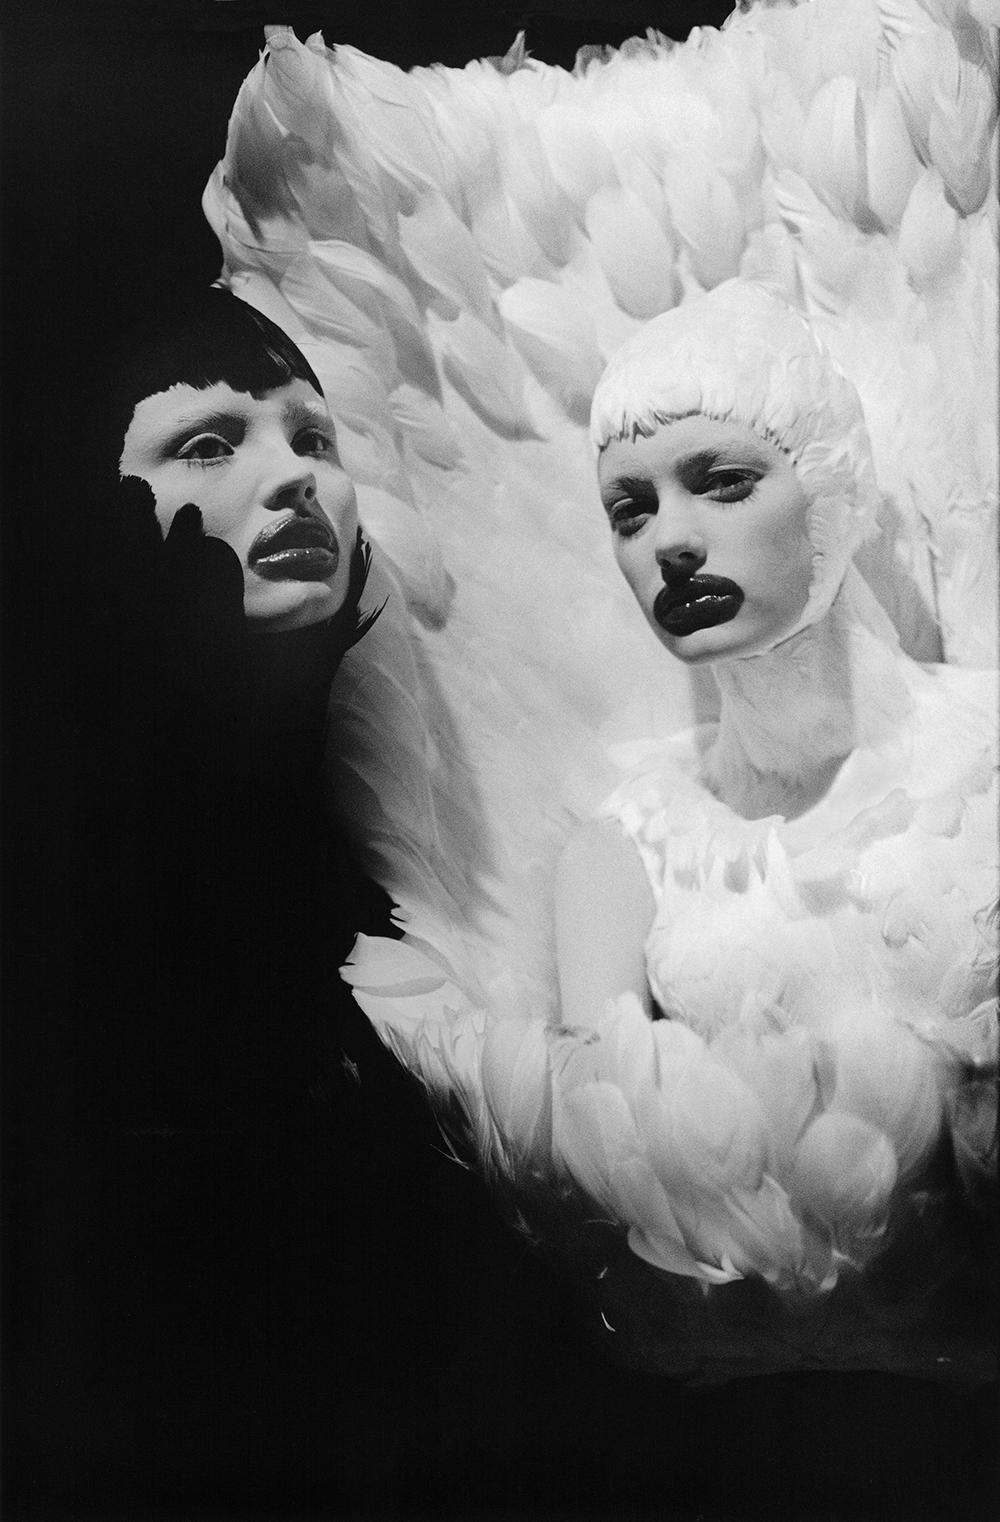 Ann Ray,  Unfallen Angels I,  Paris, 2009. Courtesy of the artist.